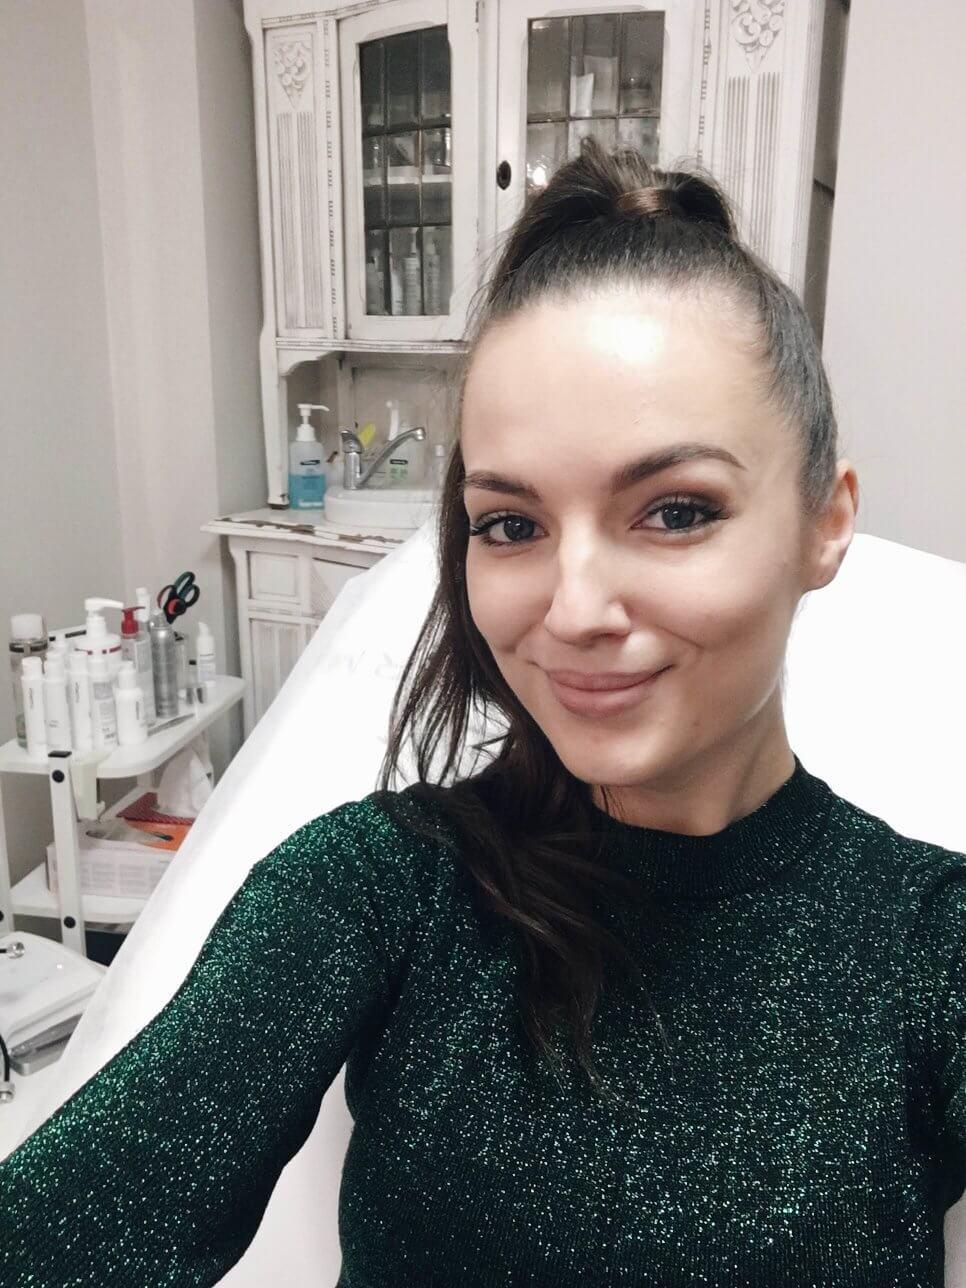 Pošventinis rūpestis oda - Simona Burbaitė - Esthederm Patirtis